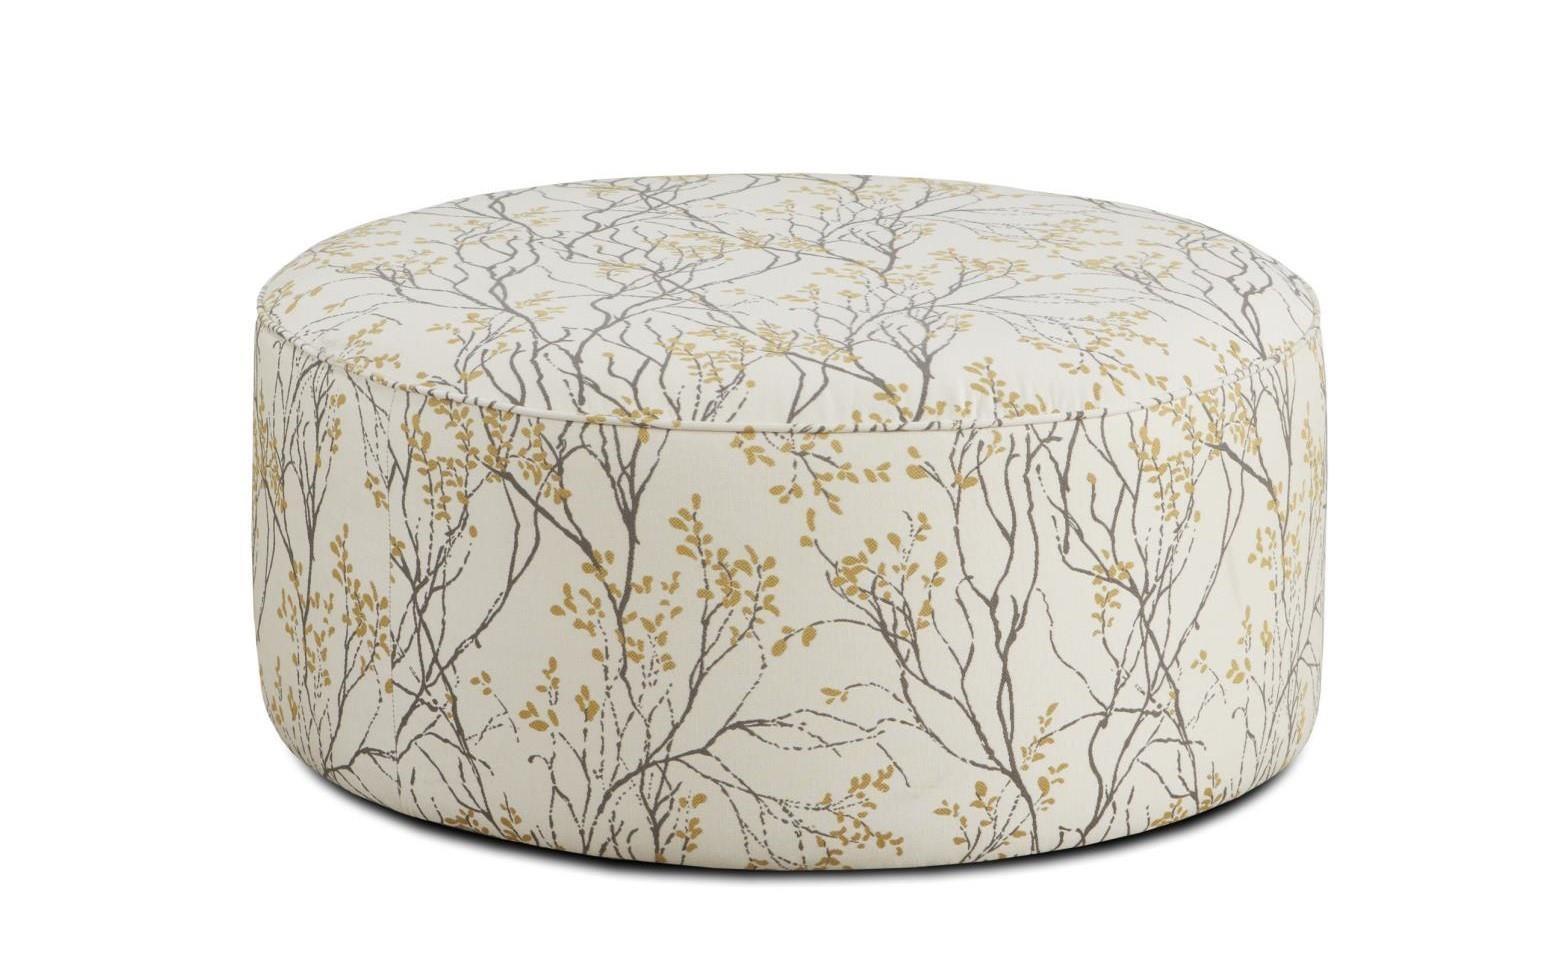 Fusion Furniture 4200 140,MYLA MARIGOLD Myla Marigold Cocktail Ottoman |  Great American Home Store | Ottomans